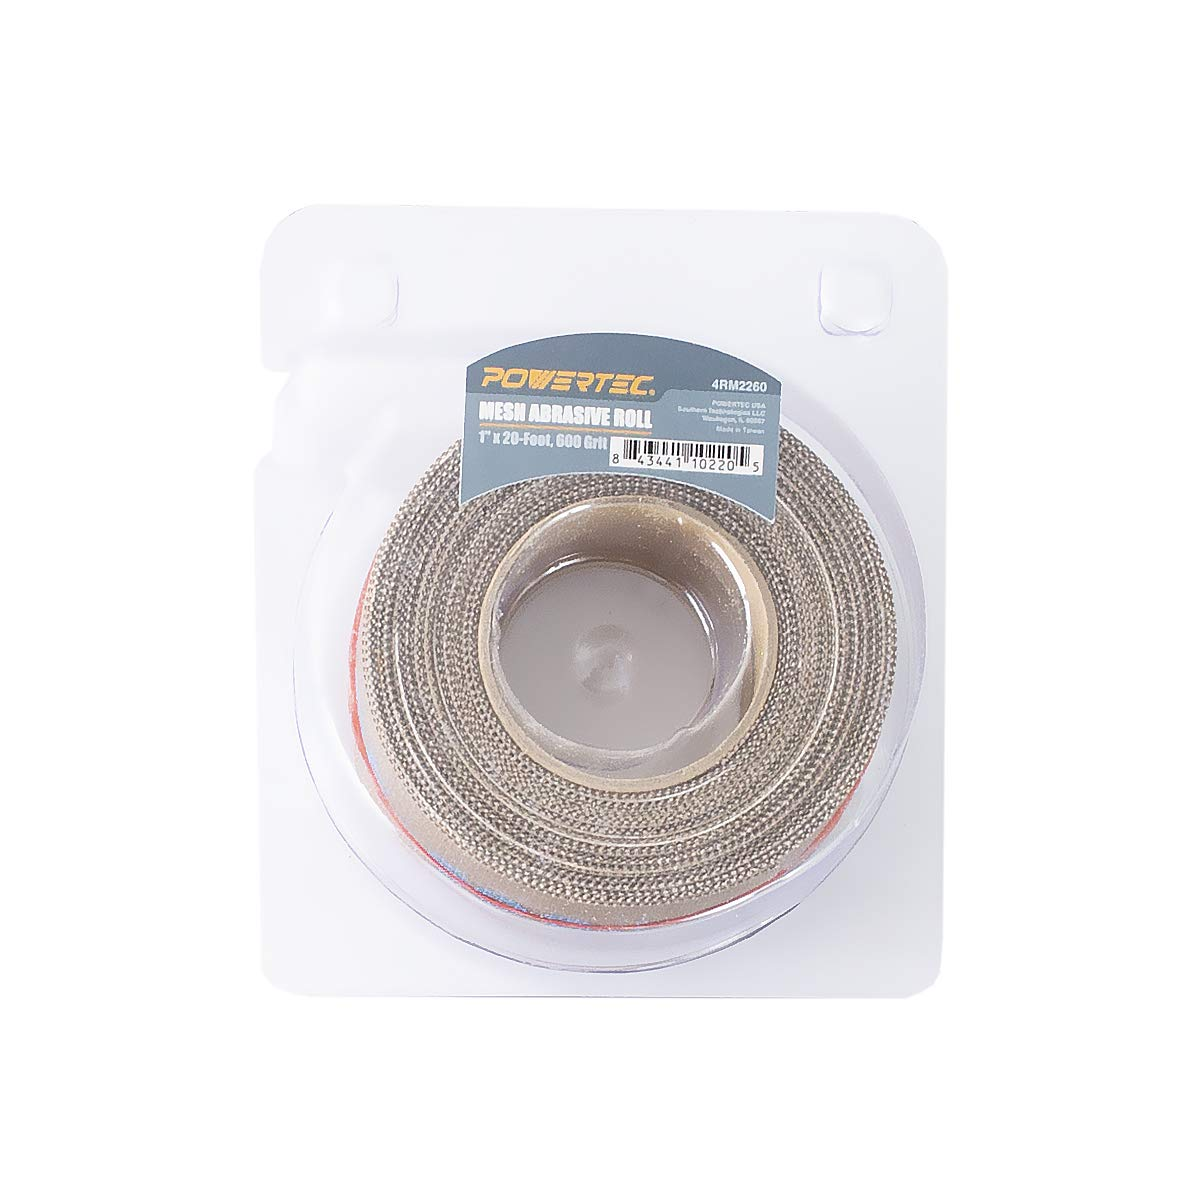 "POWERTEC 4RM2260 600 Grit Aluminum Oxide Abrasive Mesh Roll 1/"" x 20/' In Self-Dispensing Clear Blister Pack"